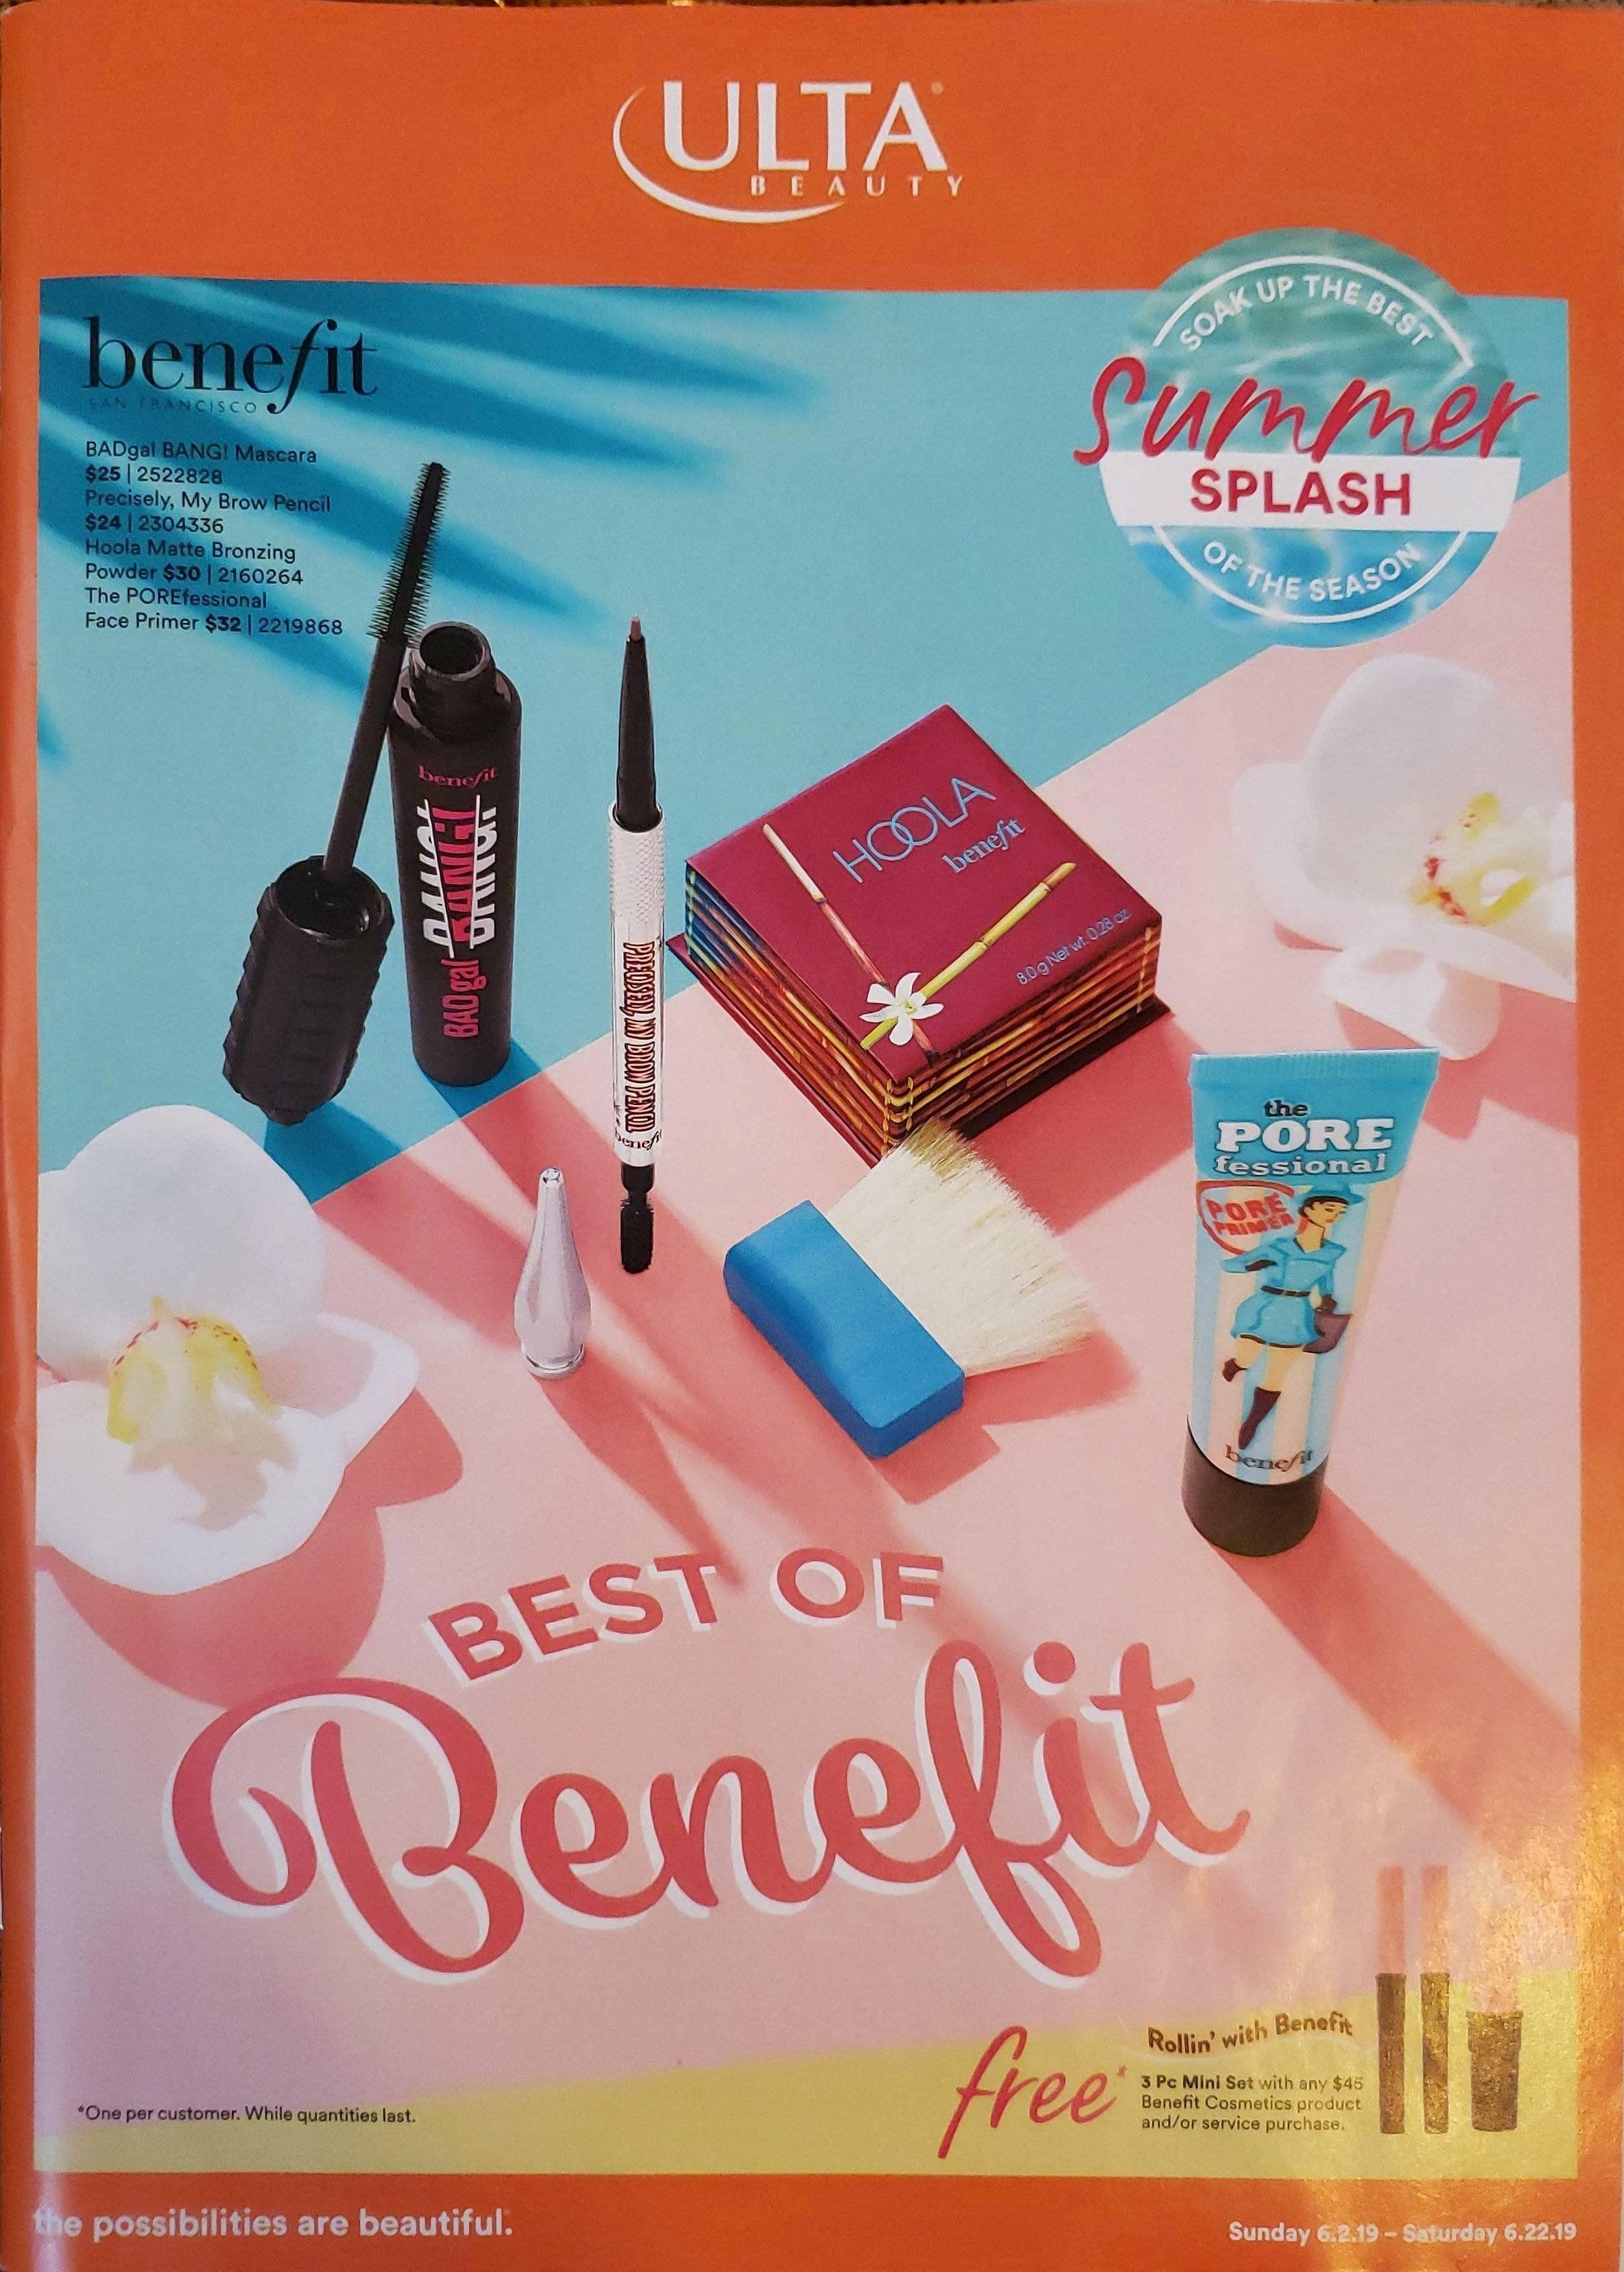 Full Scan Of The Newest Ulta Catalog 6 2 19 6 22 19 Muaonthecheap Ulta Skin Essentials Benefit Cosmetics